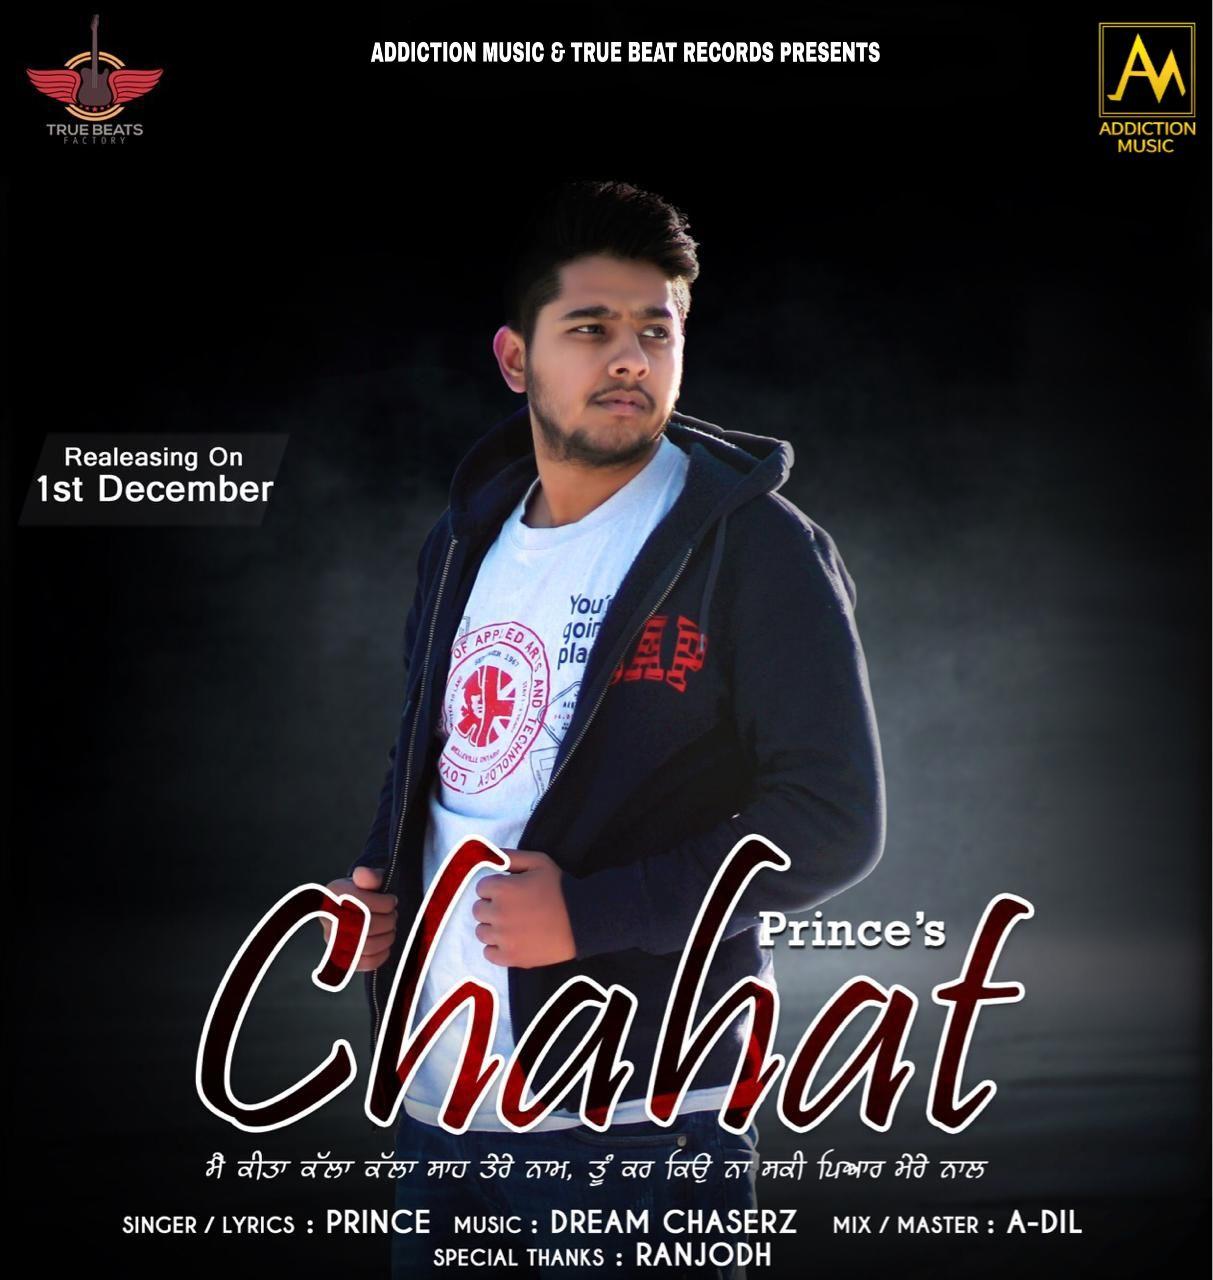 chahat mp3 song singer prince new punjabi song Upload mp3